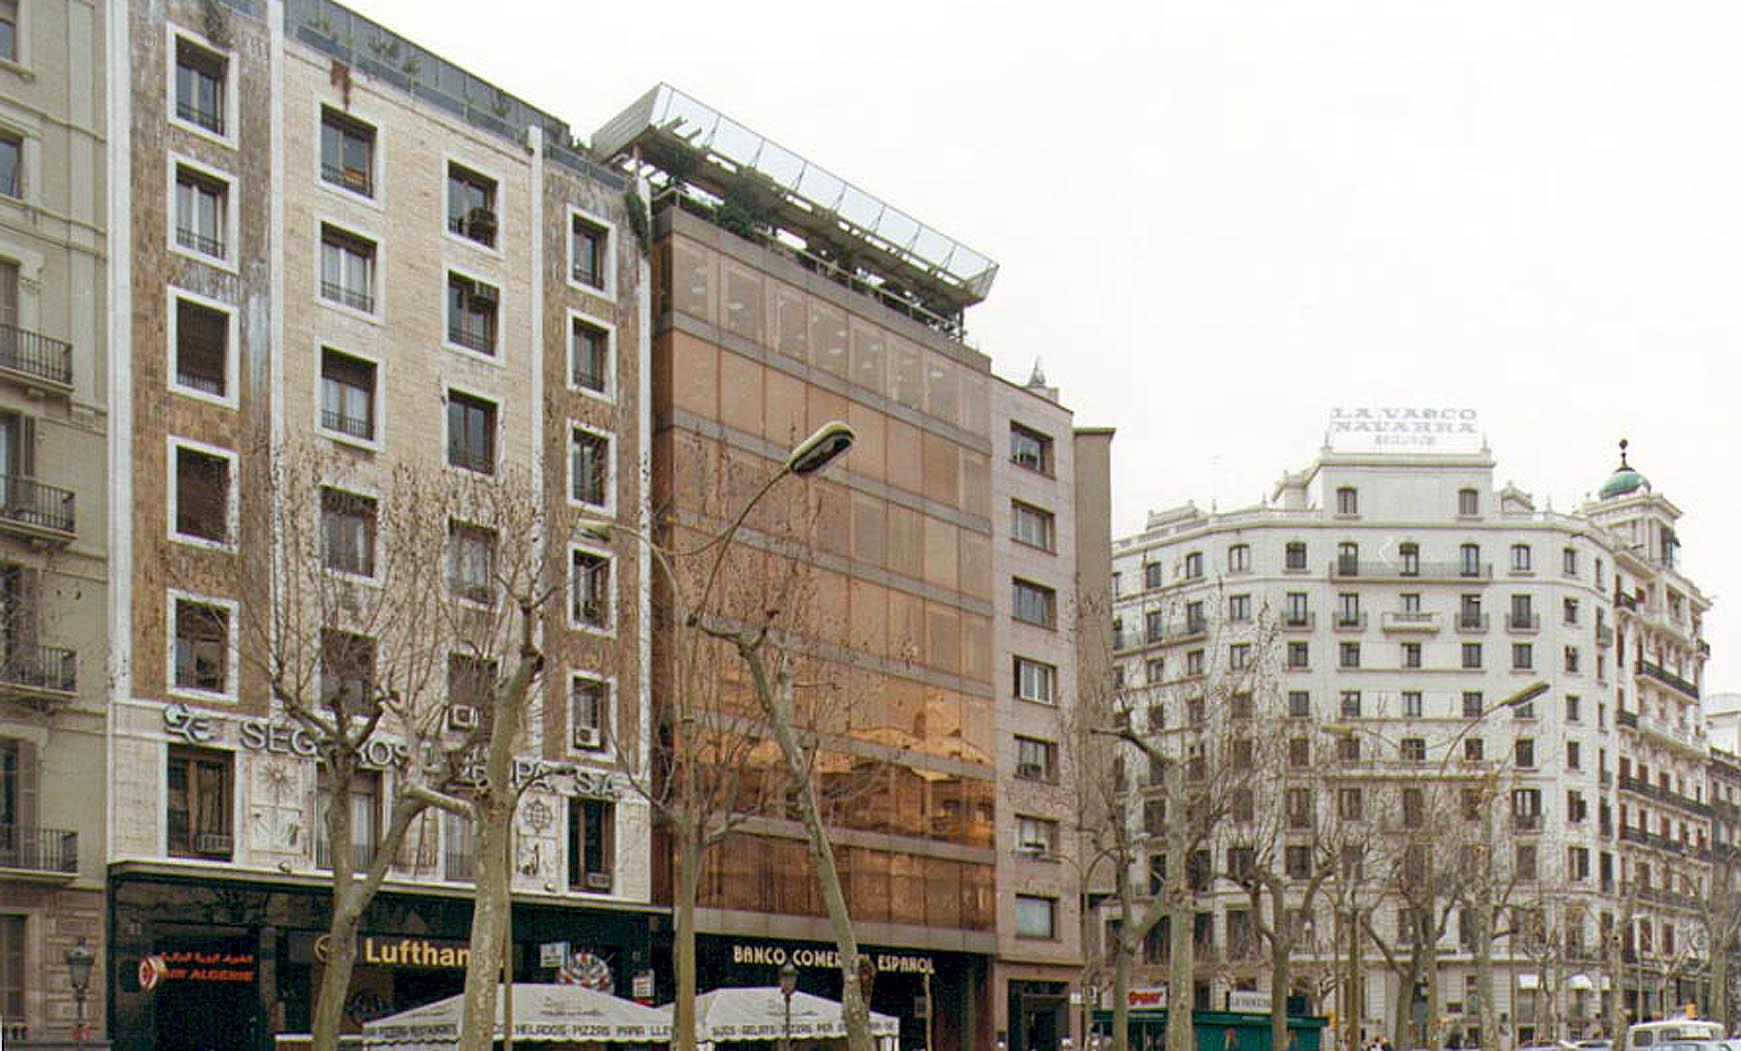 Banco Comercial Español en Pº de Gracia, Barcelona (1974), en colaboración con Francesc Mitjans